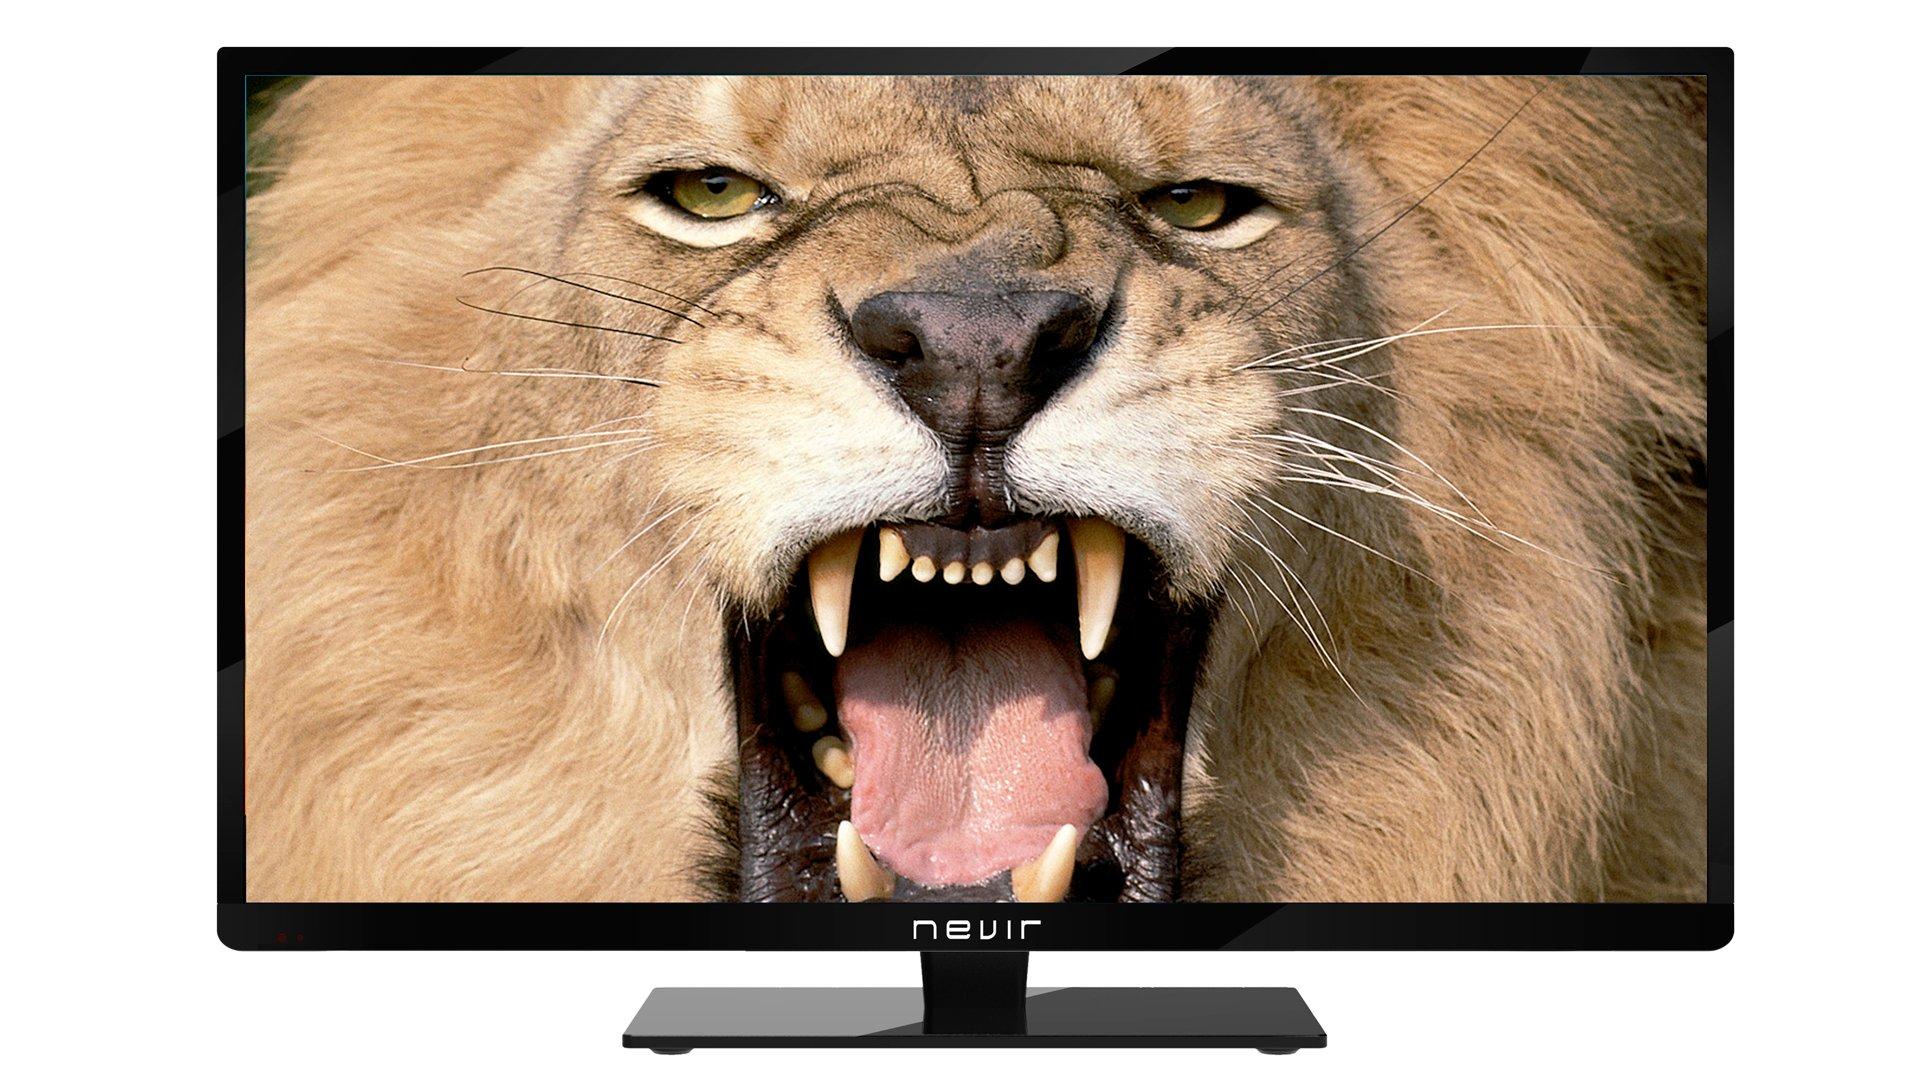 28 NVR-7406-28HD-N SLIM Televisor LED 28 NEVIR: Amazon.es: Electrónica